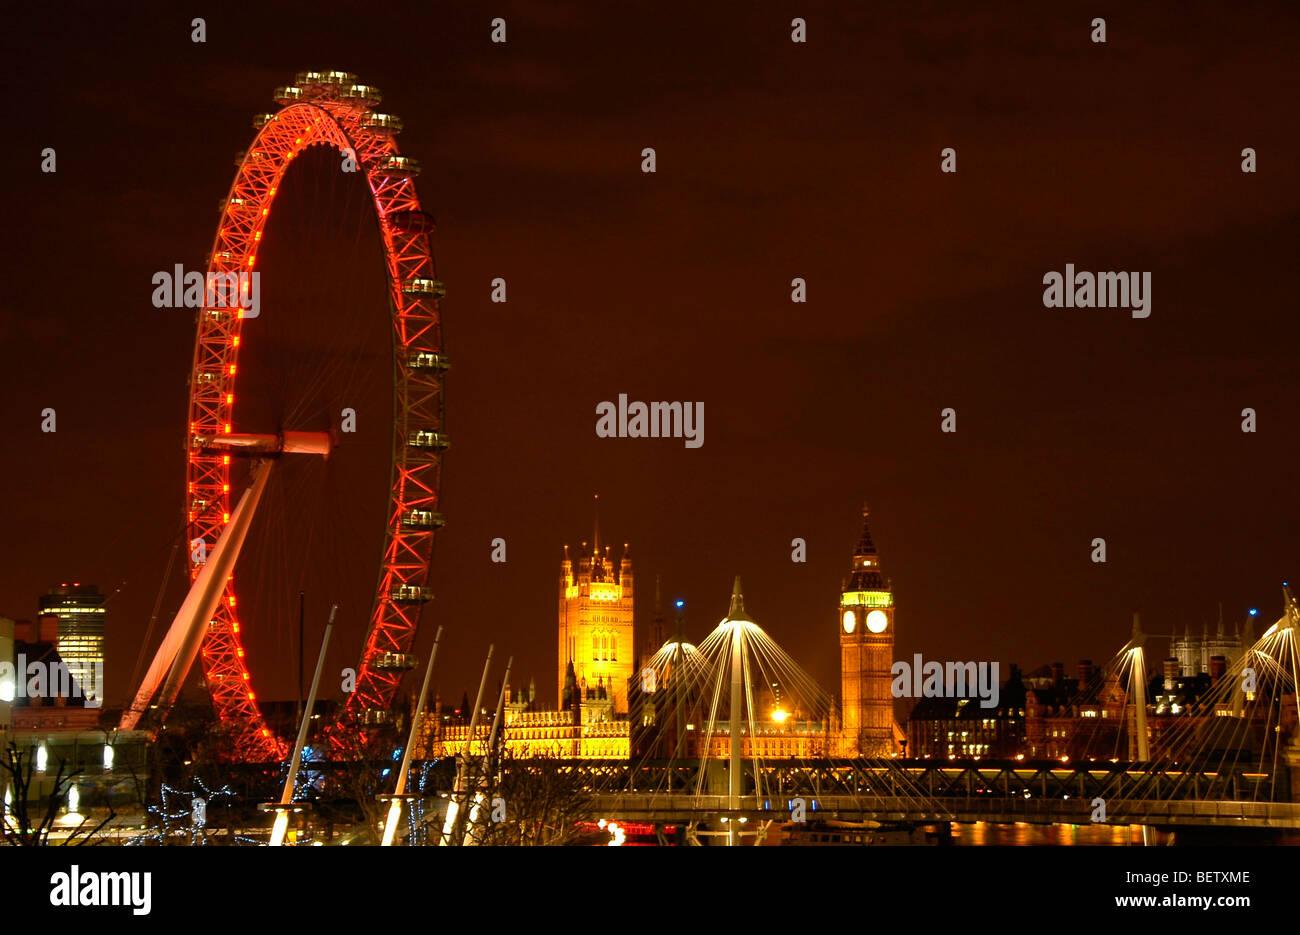 london at night - Stock Image